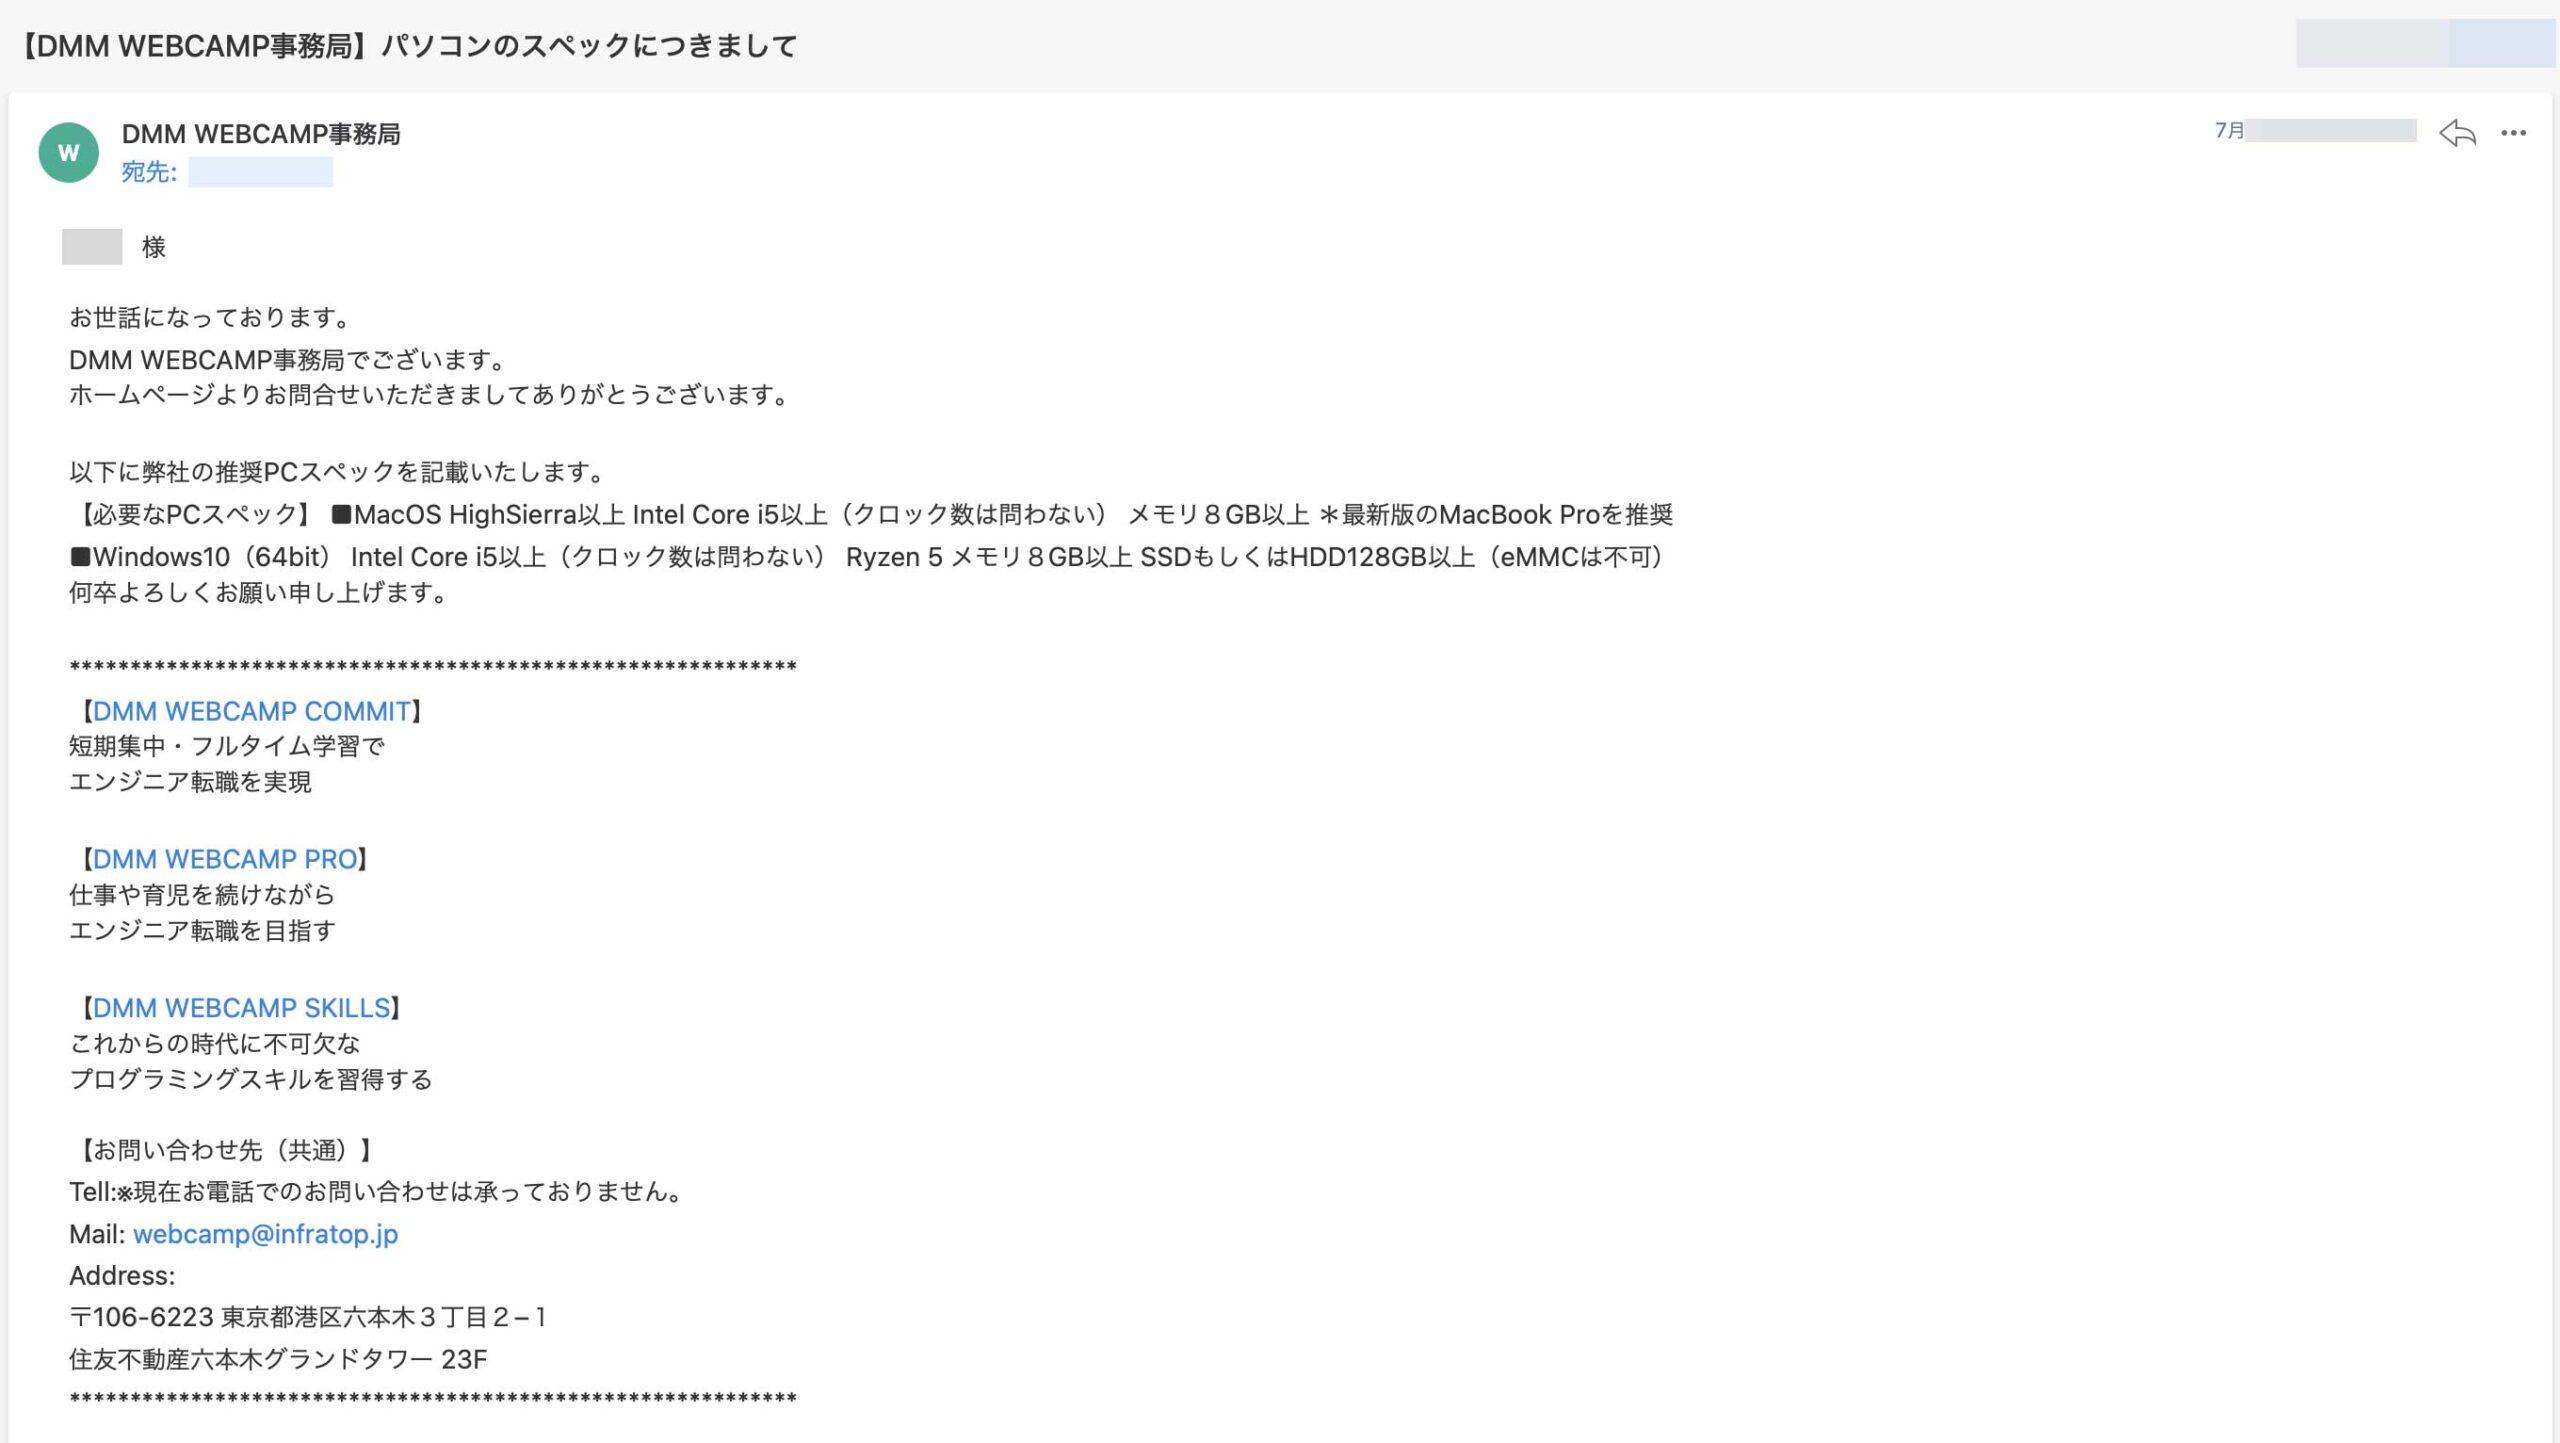 DMM WEBCAMPからのメール